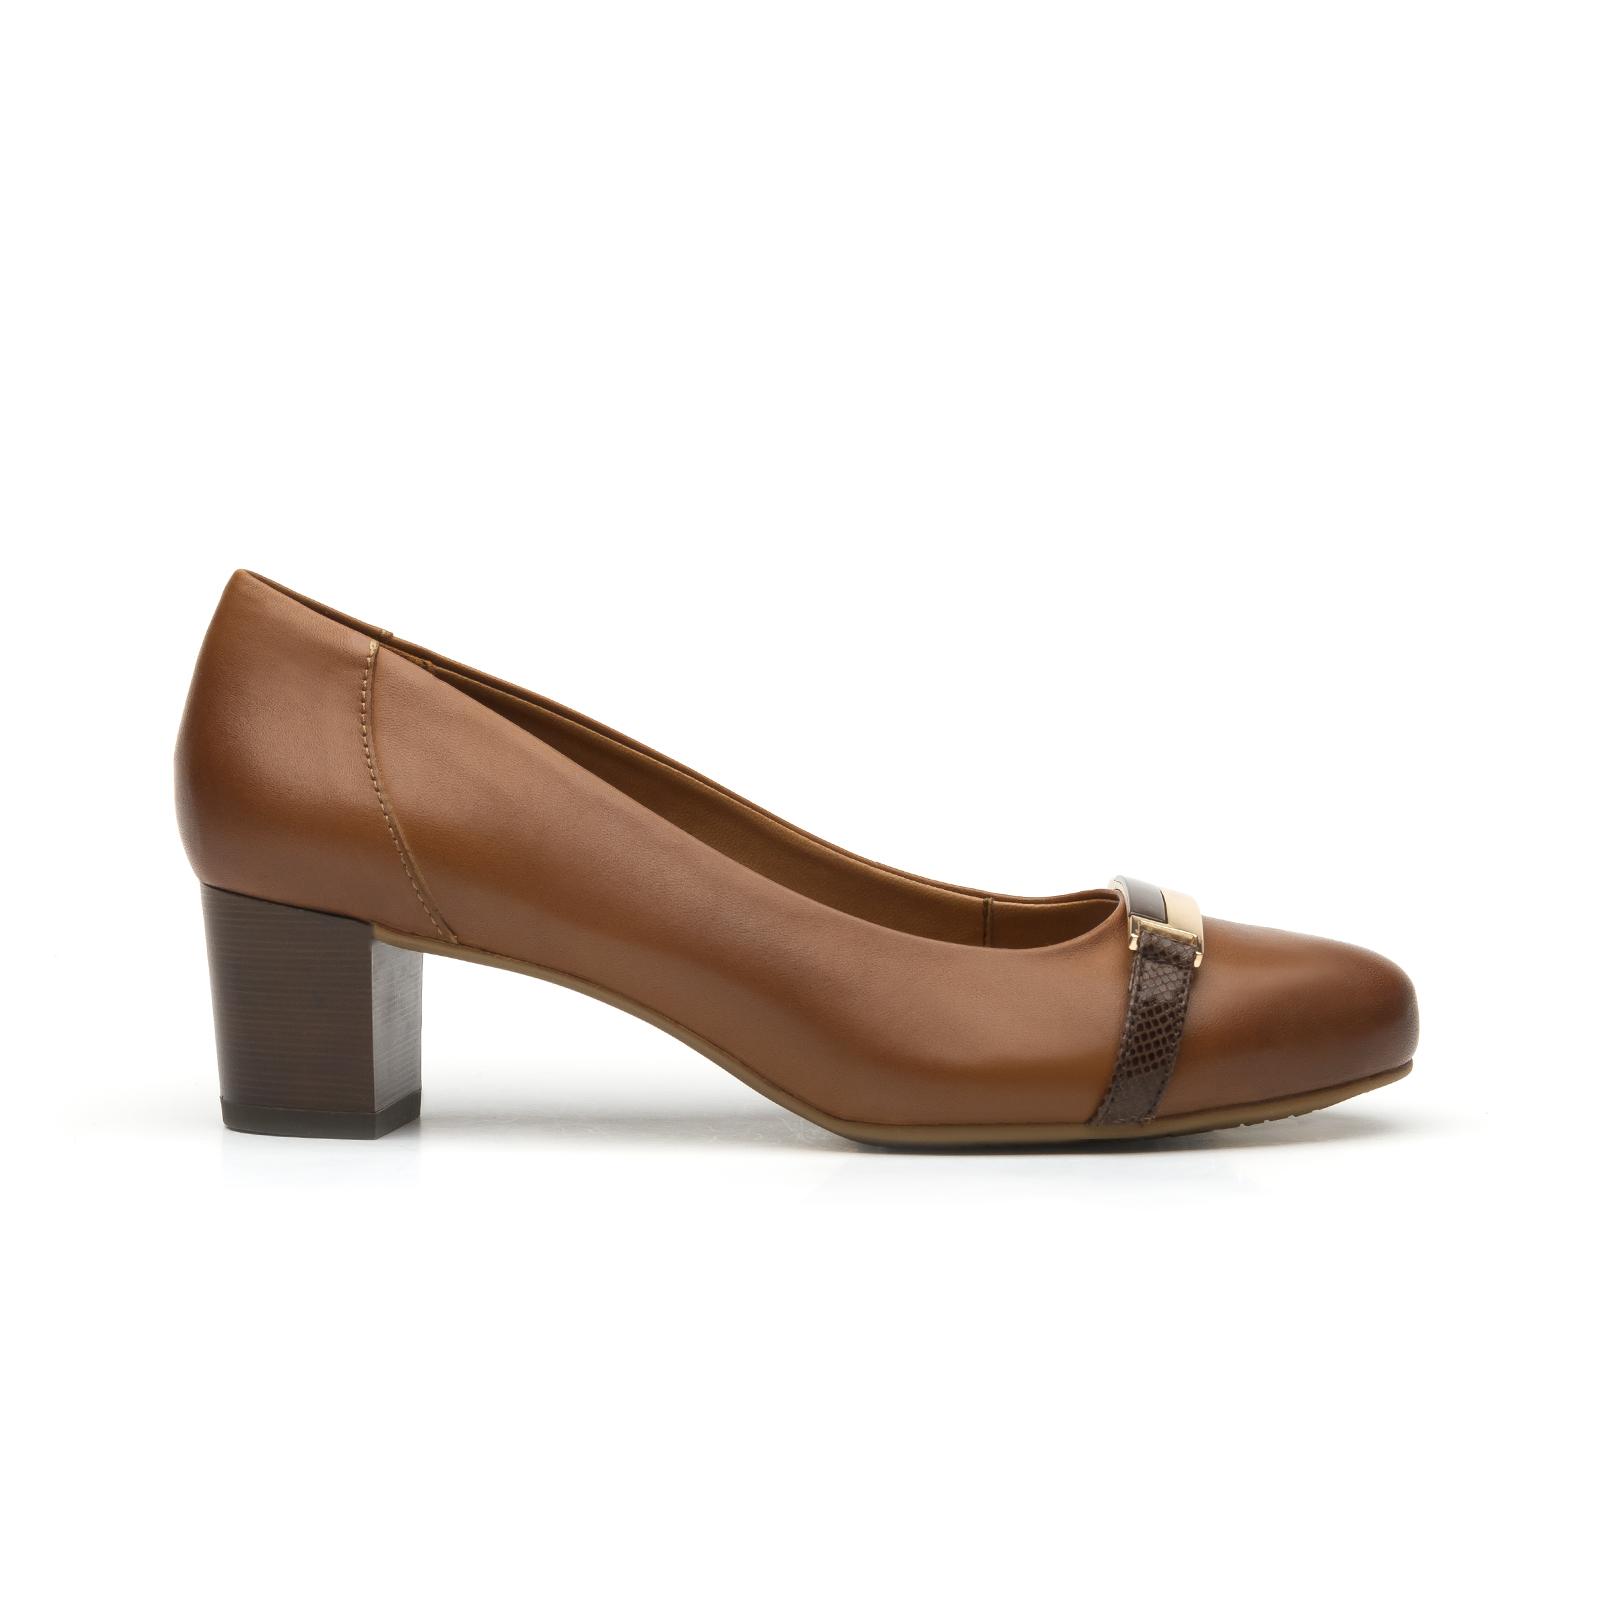 Nany 47402 In Brandy Women S Pump Flexi Shoes United